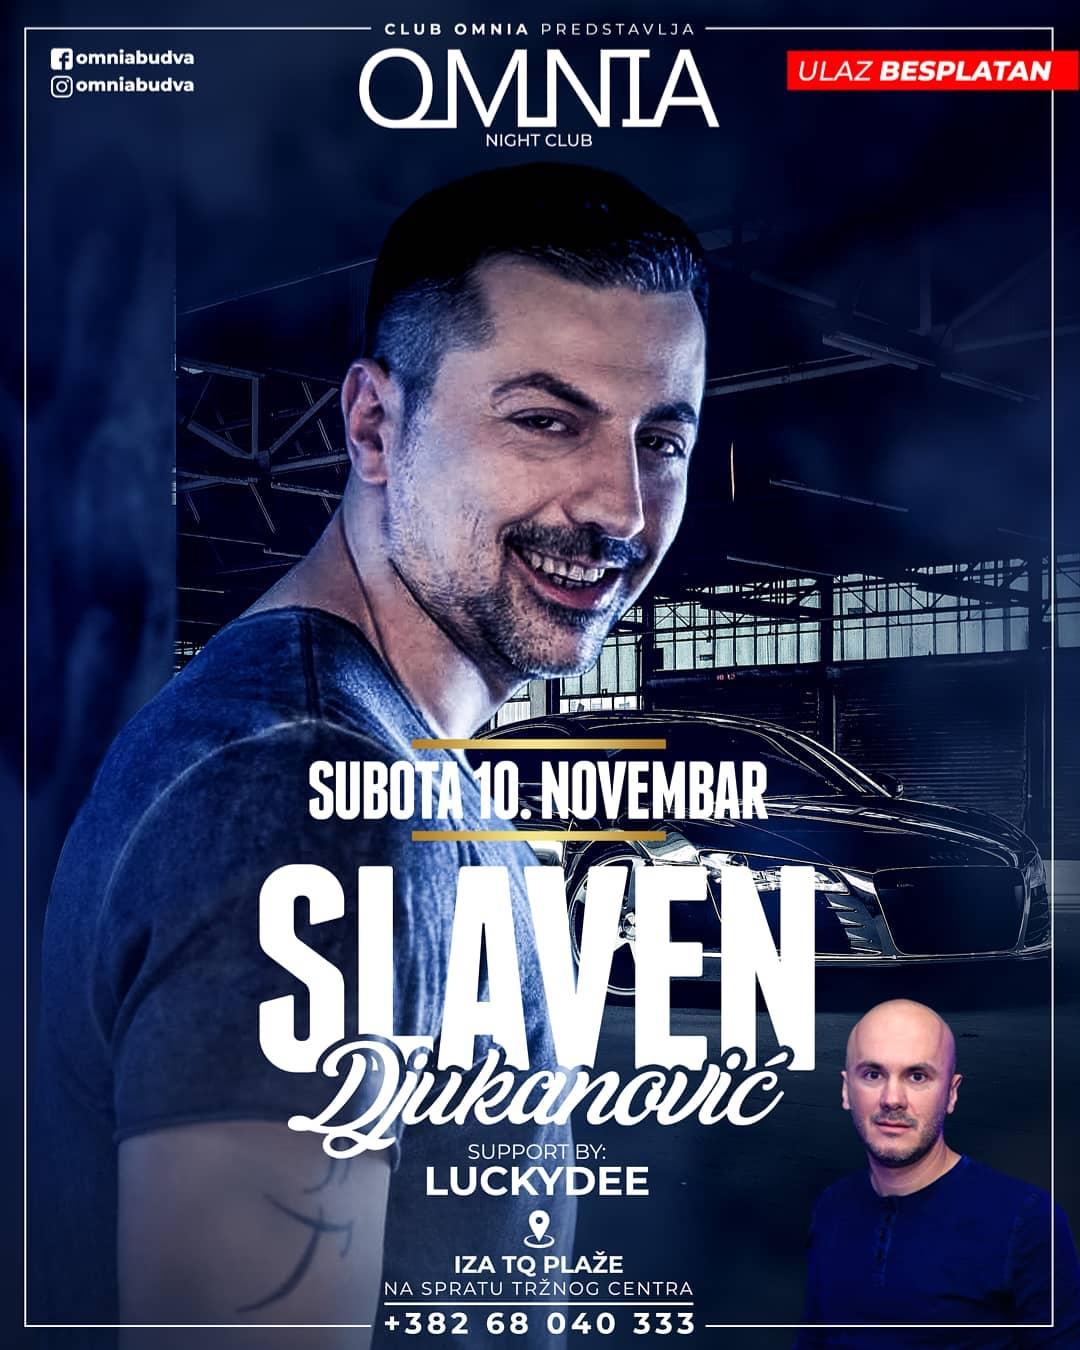 Slaven Đukanović & LuckyDee